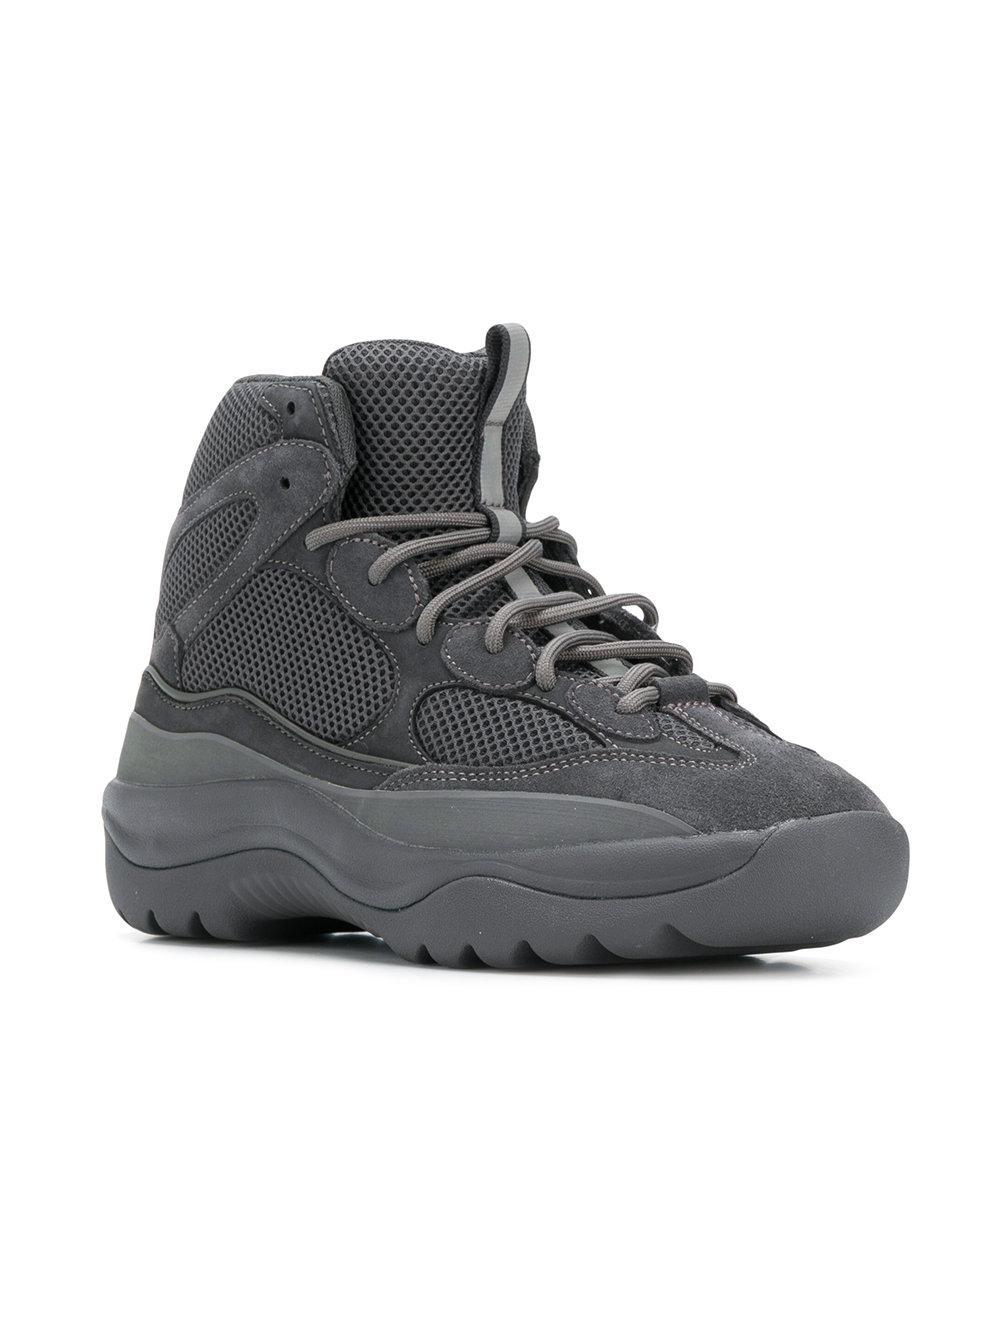 Yeezy Leather Season 6 Desert Rat Boots